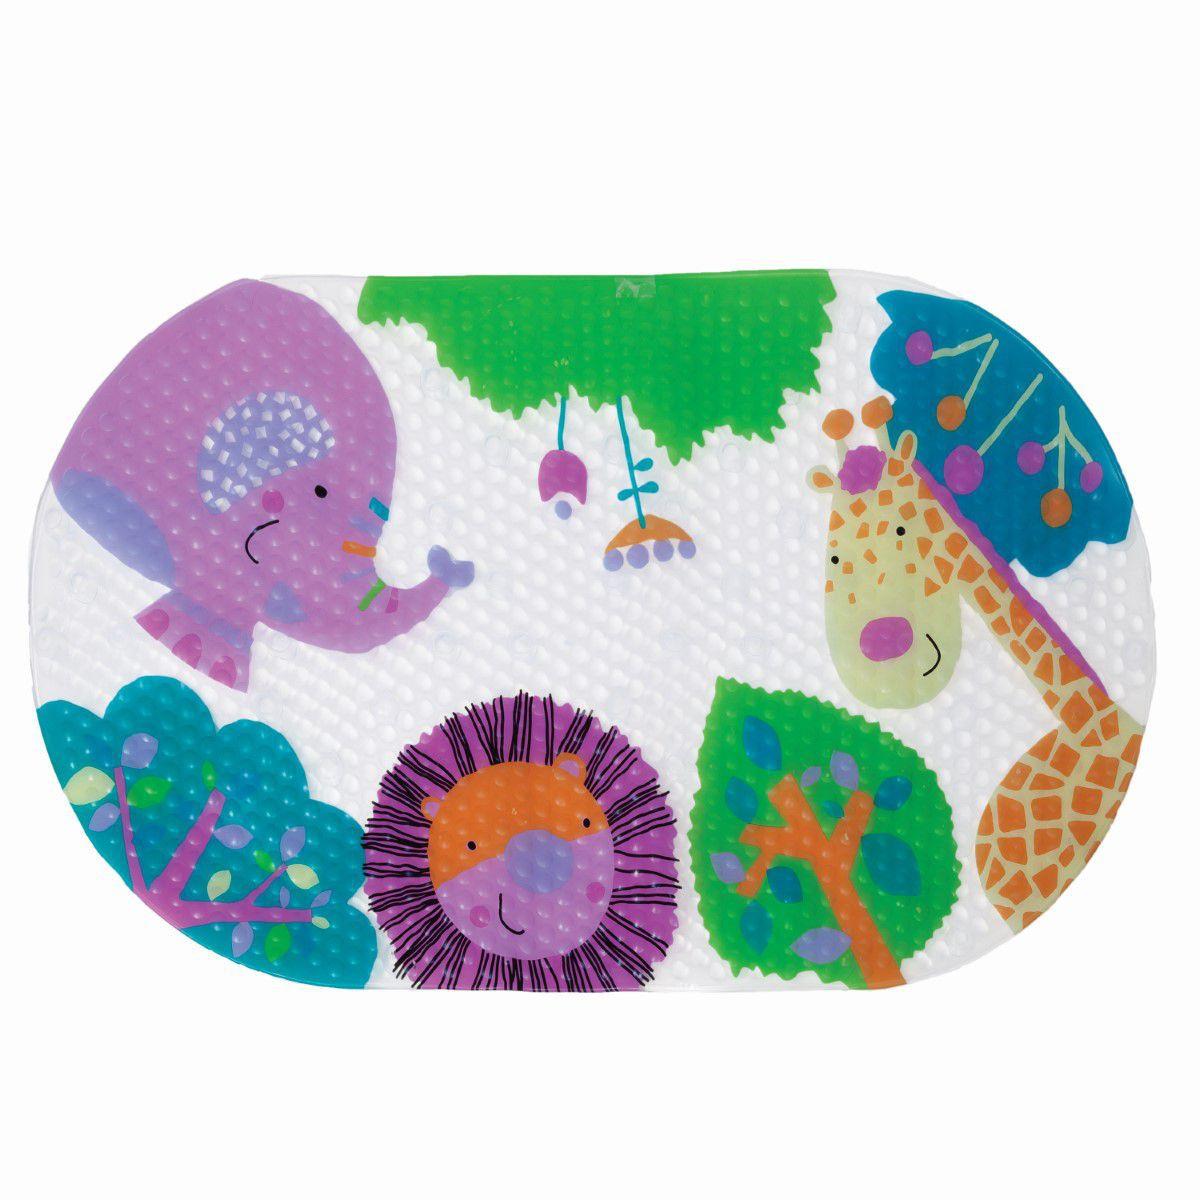 Tapete Para Banho Antiderrapante Unisex para Crianca Buba Baby Multicor Selvinha Infantil.